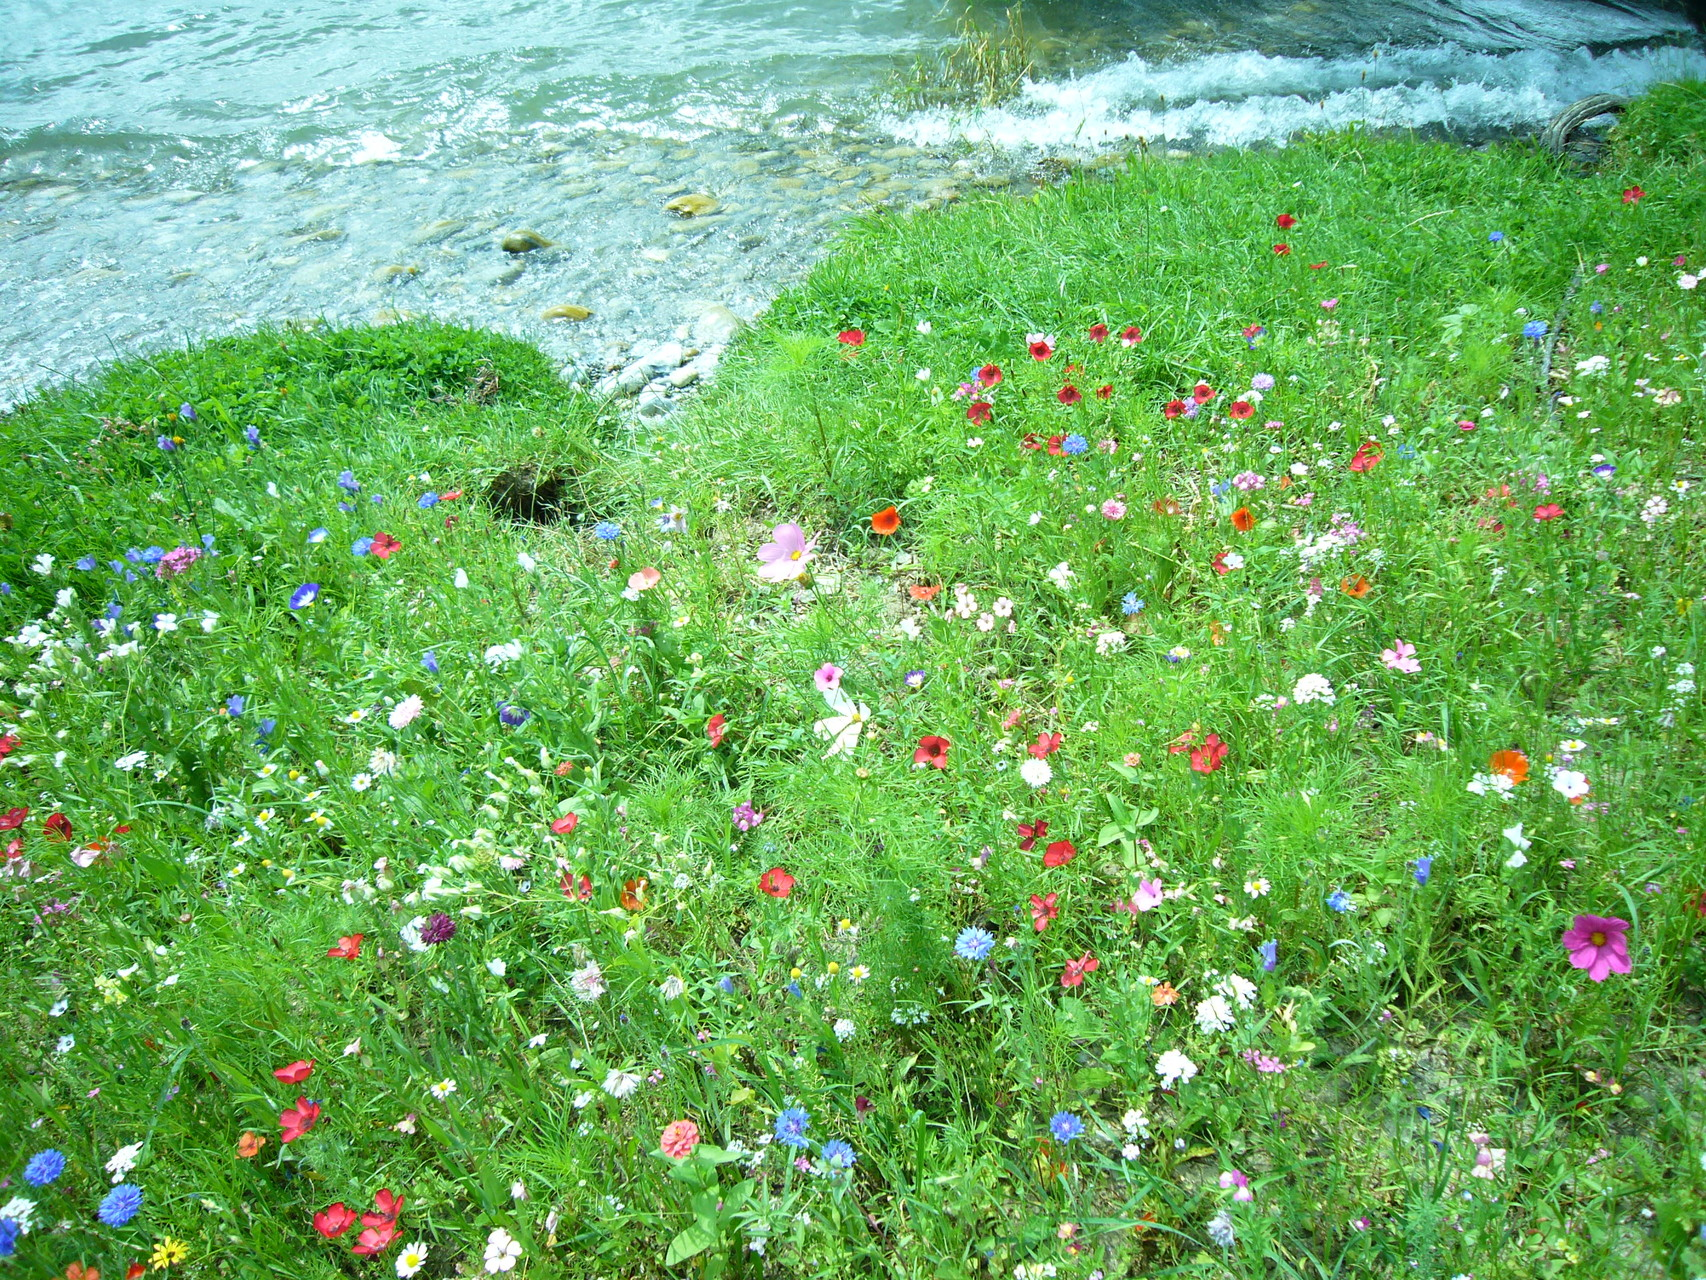 Blumenpracht am See